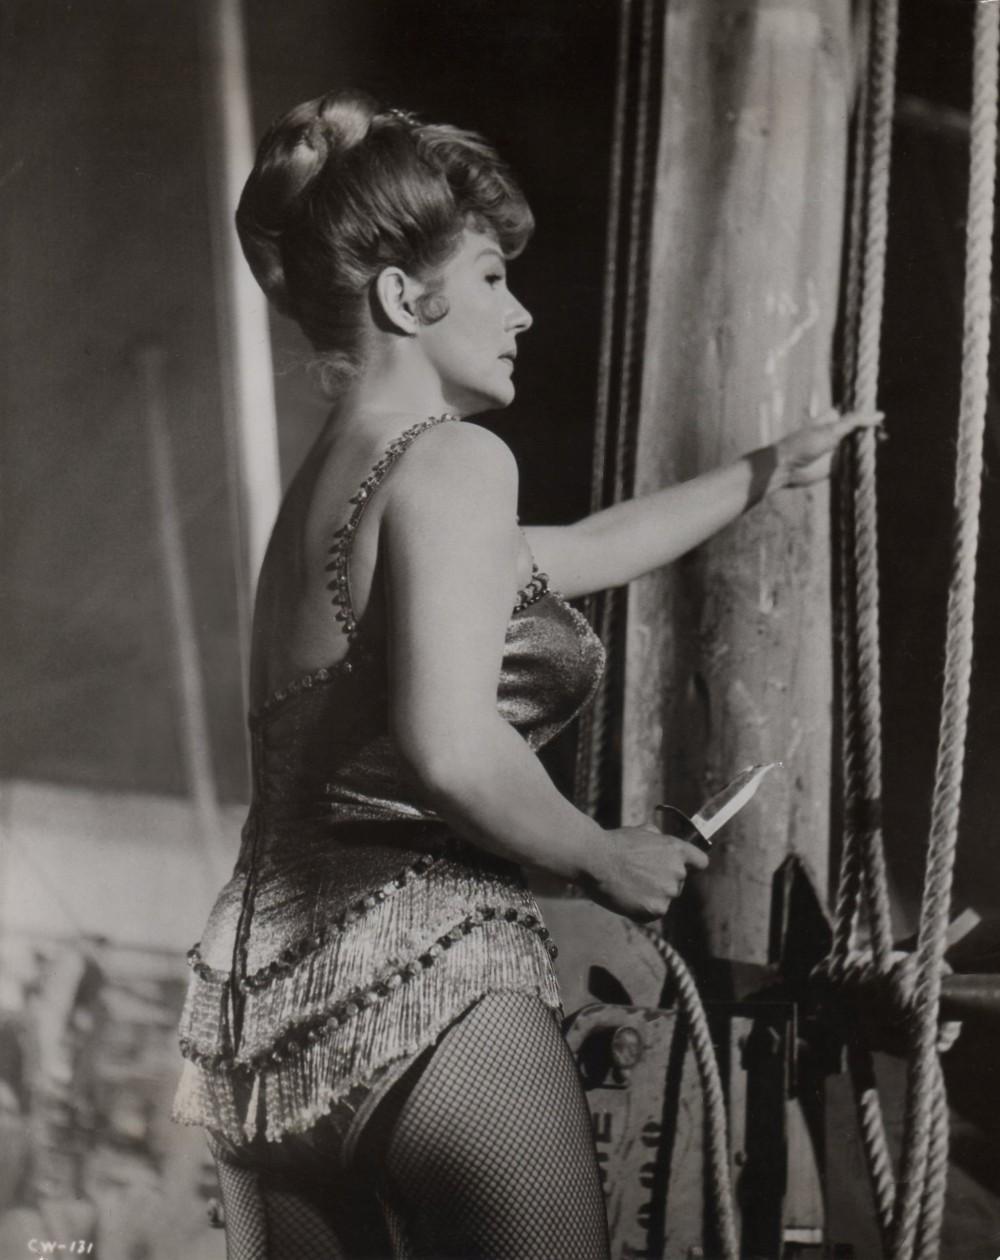 Le Plus Grand Cirque du Monde - Circus World - 1964  - Page 2 Duke1417